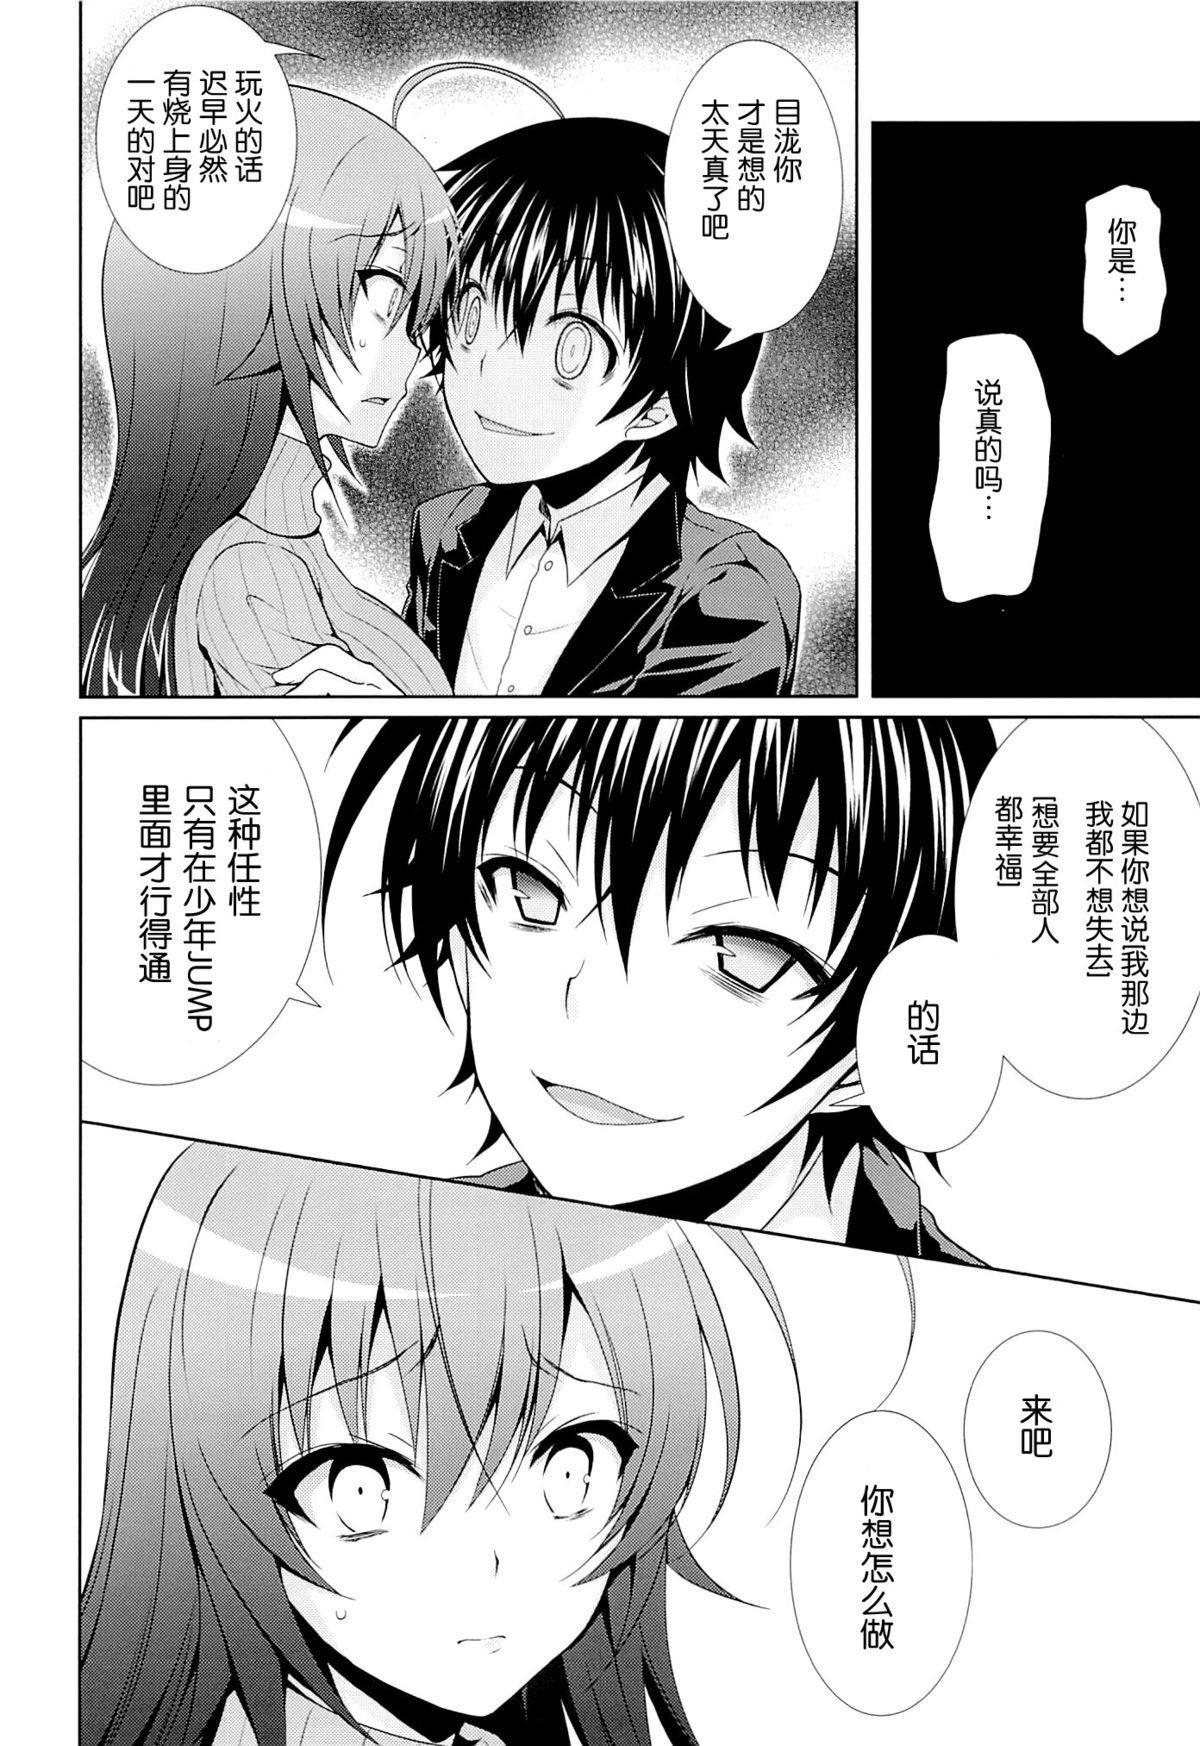 (C87) [Sugar*Berry*Syrup (Kuroe)] Hitozuma Medaka-chan (26) ga Kumagawa-kun ni NTR-reru Hon (Medaka Box) [Chinese] [脸肿汉化组] 25